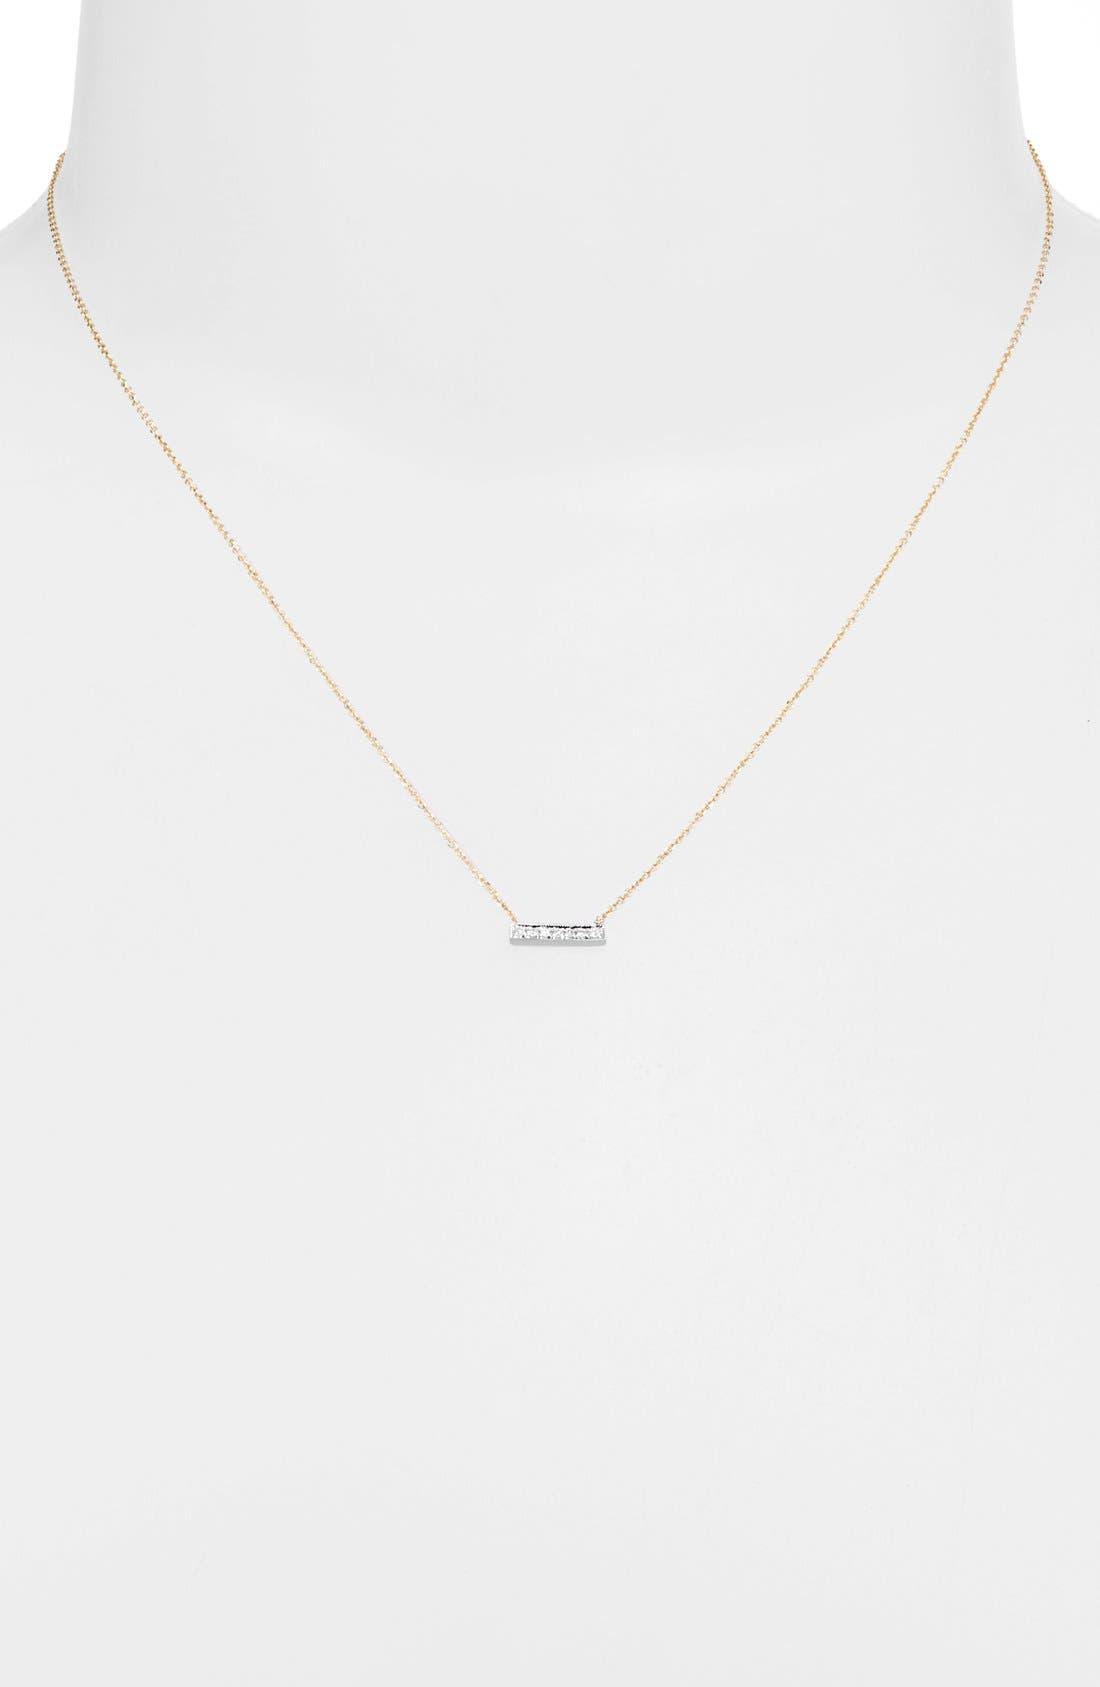 DANA REBECCA DESIGNS, 'Sylvie Rose' Diamond Bar Pendant Necklace, Alternate thumbnail 7, color, YELLOW GOLD